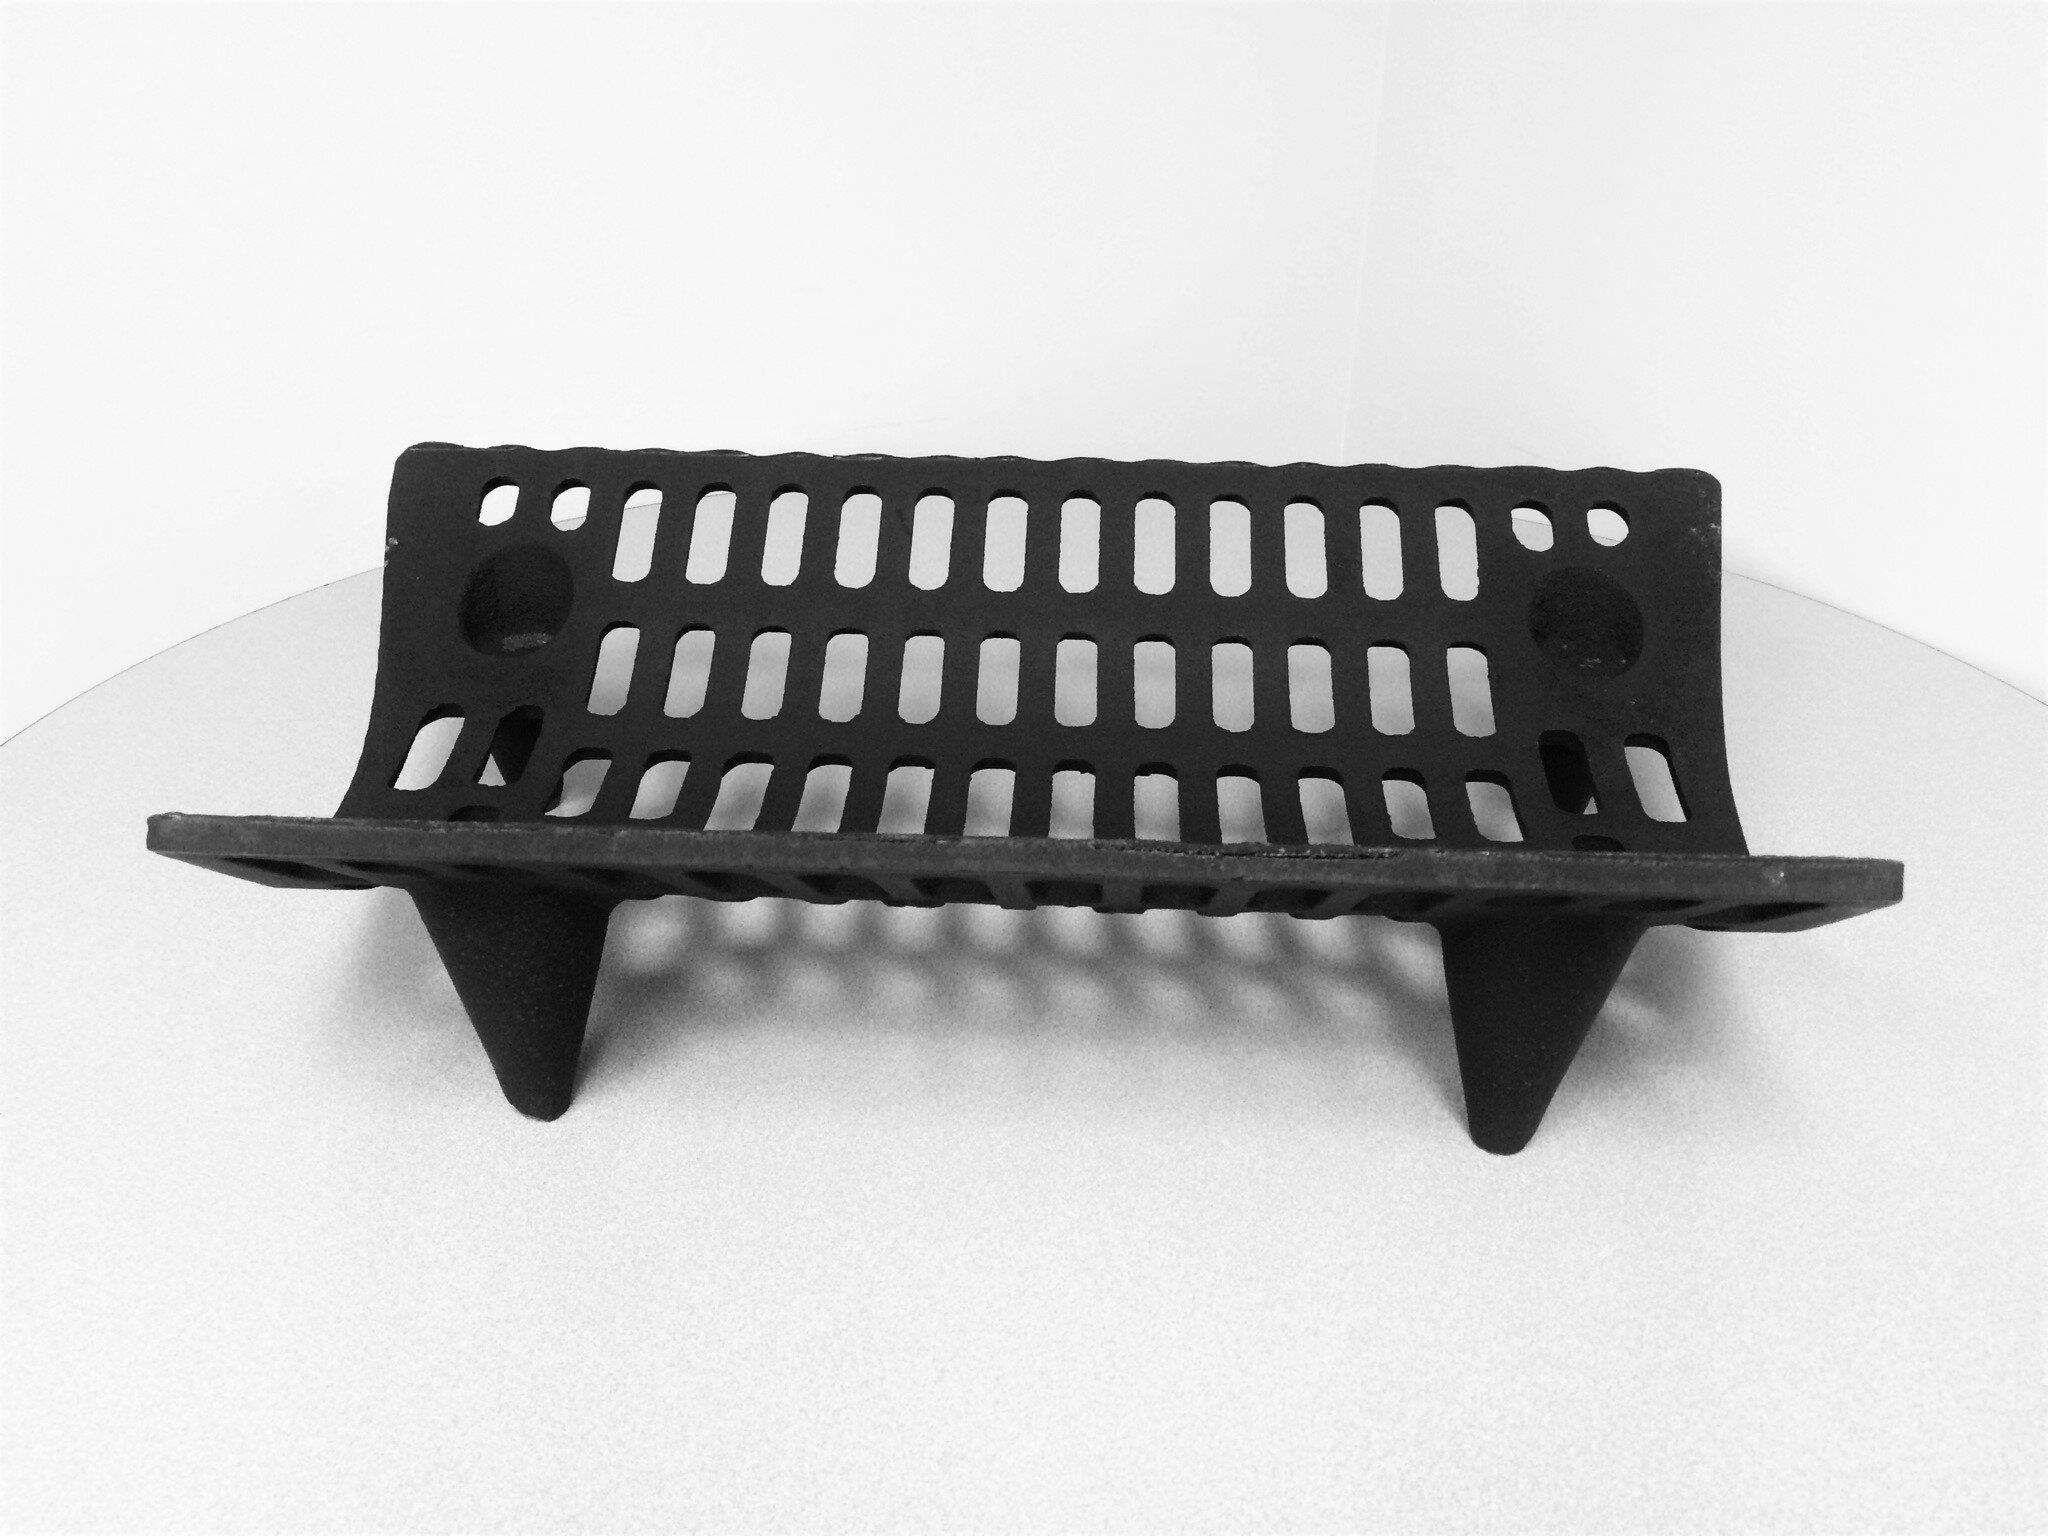 Vestal Manufacturing Fireplace Grate Reviews Wayfair